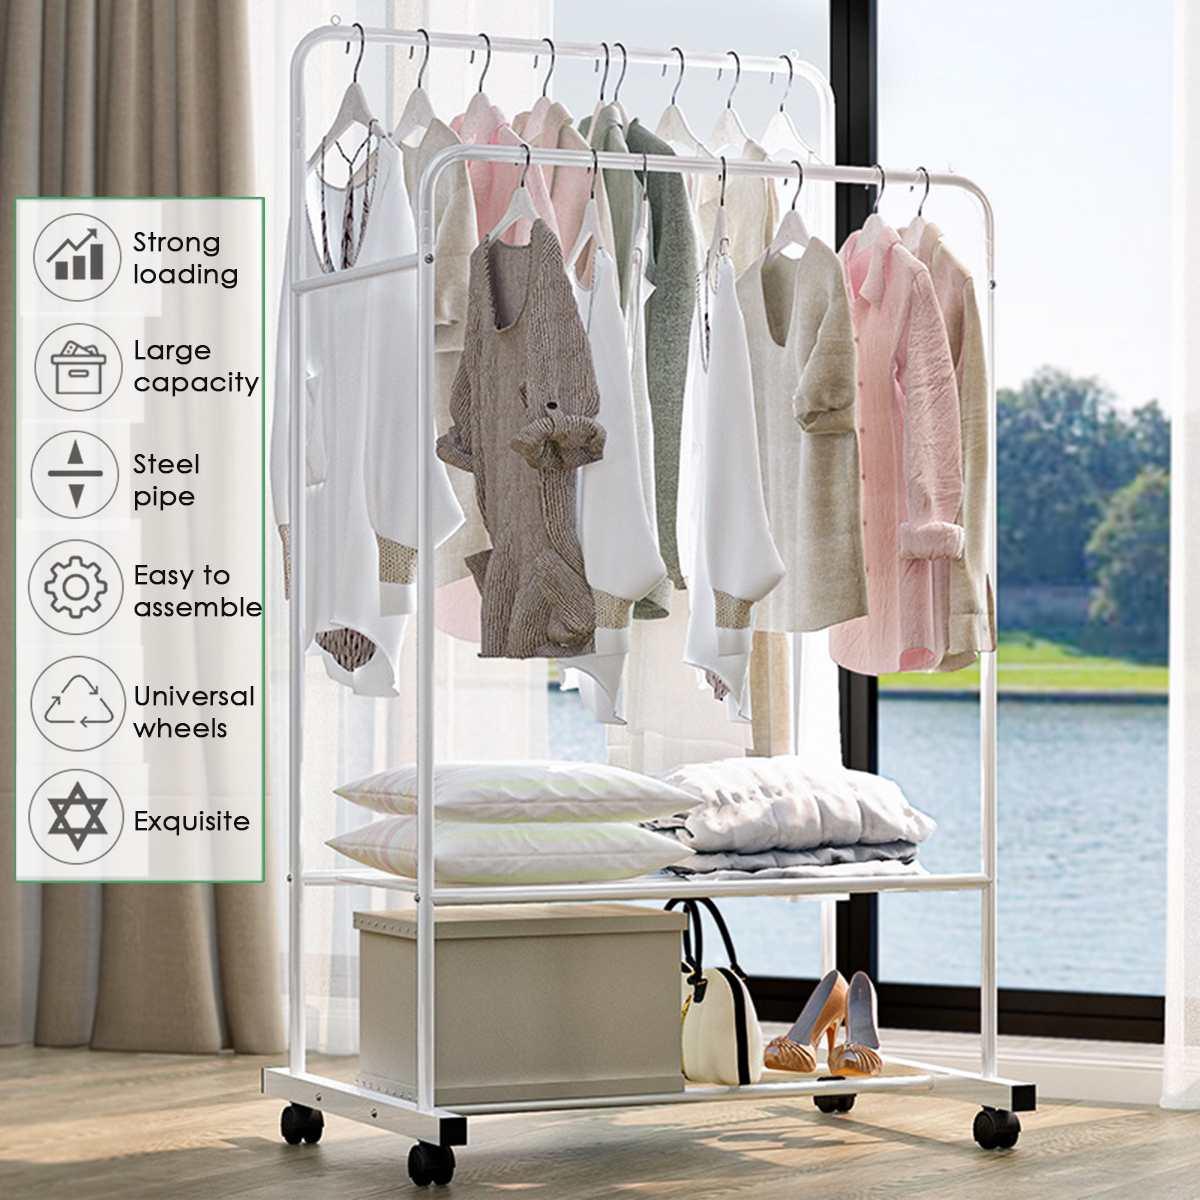 2 Rows White Metal Clothes Hanger Coat Rack Floor Wheeled Hanger Storage Wardrobe Clothing Drying Racks With Shoes Garment Shelf